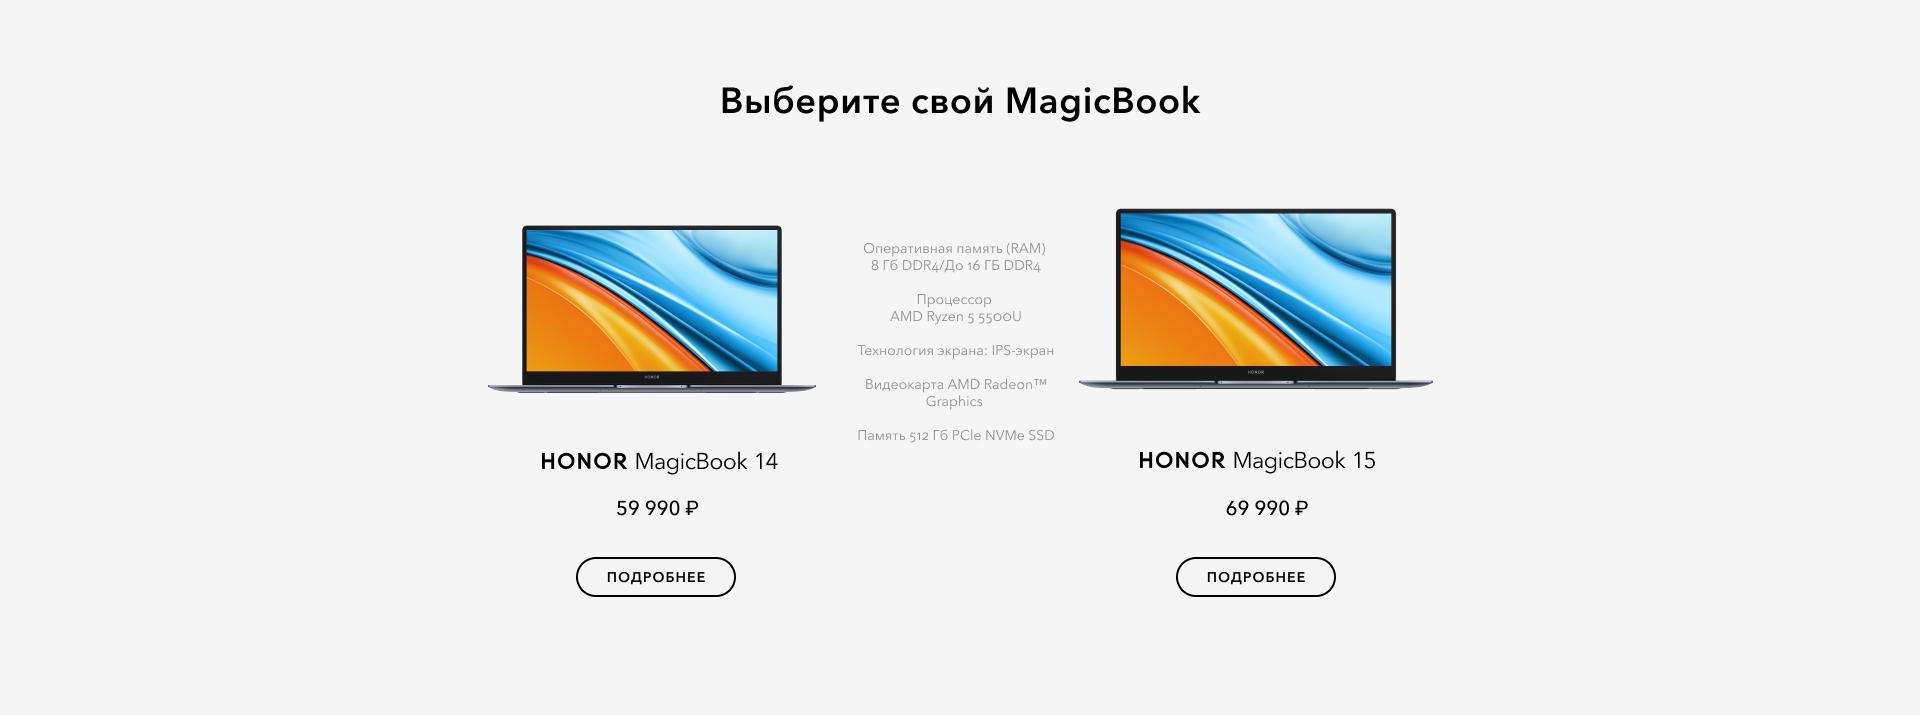 Выберите свой MagicBook